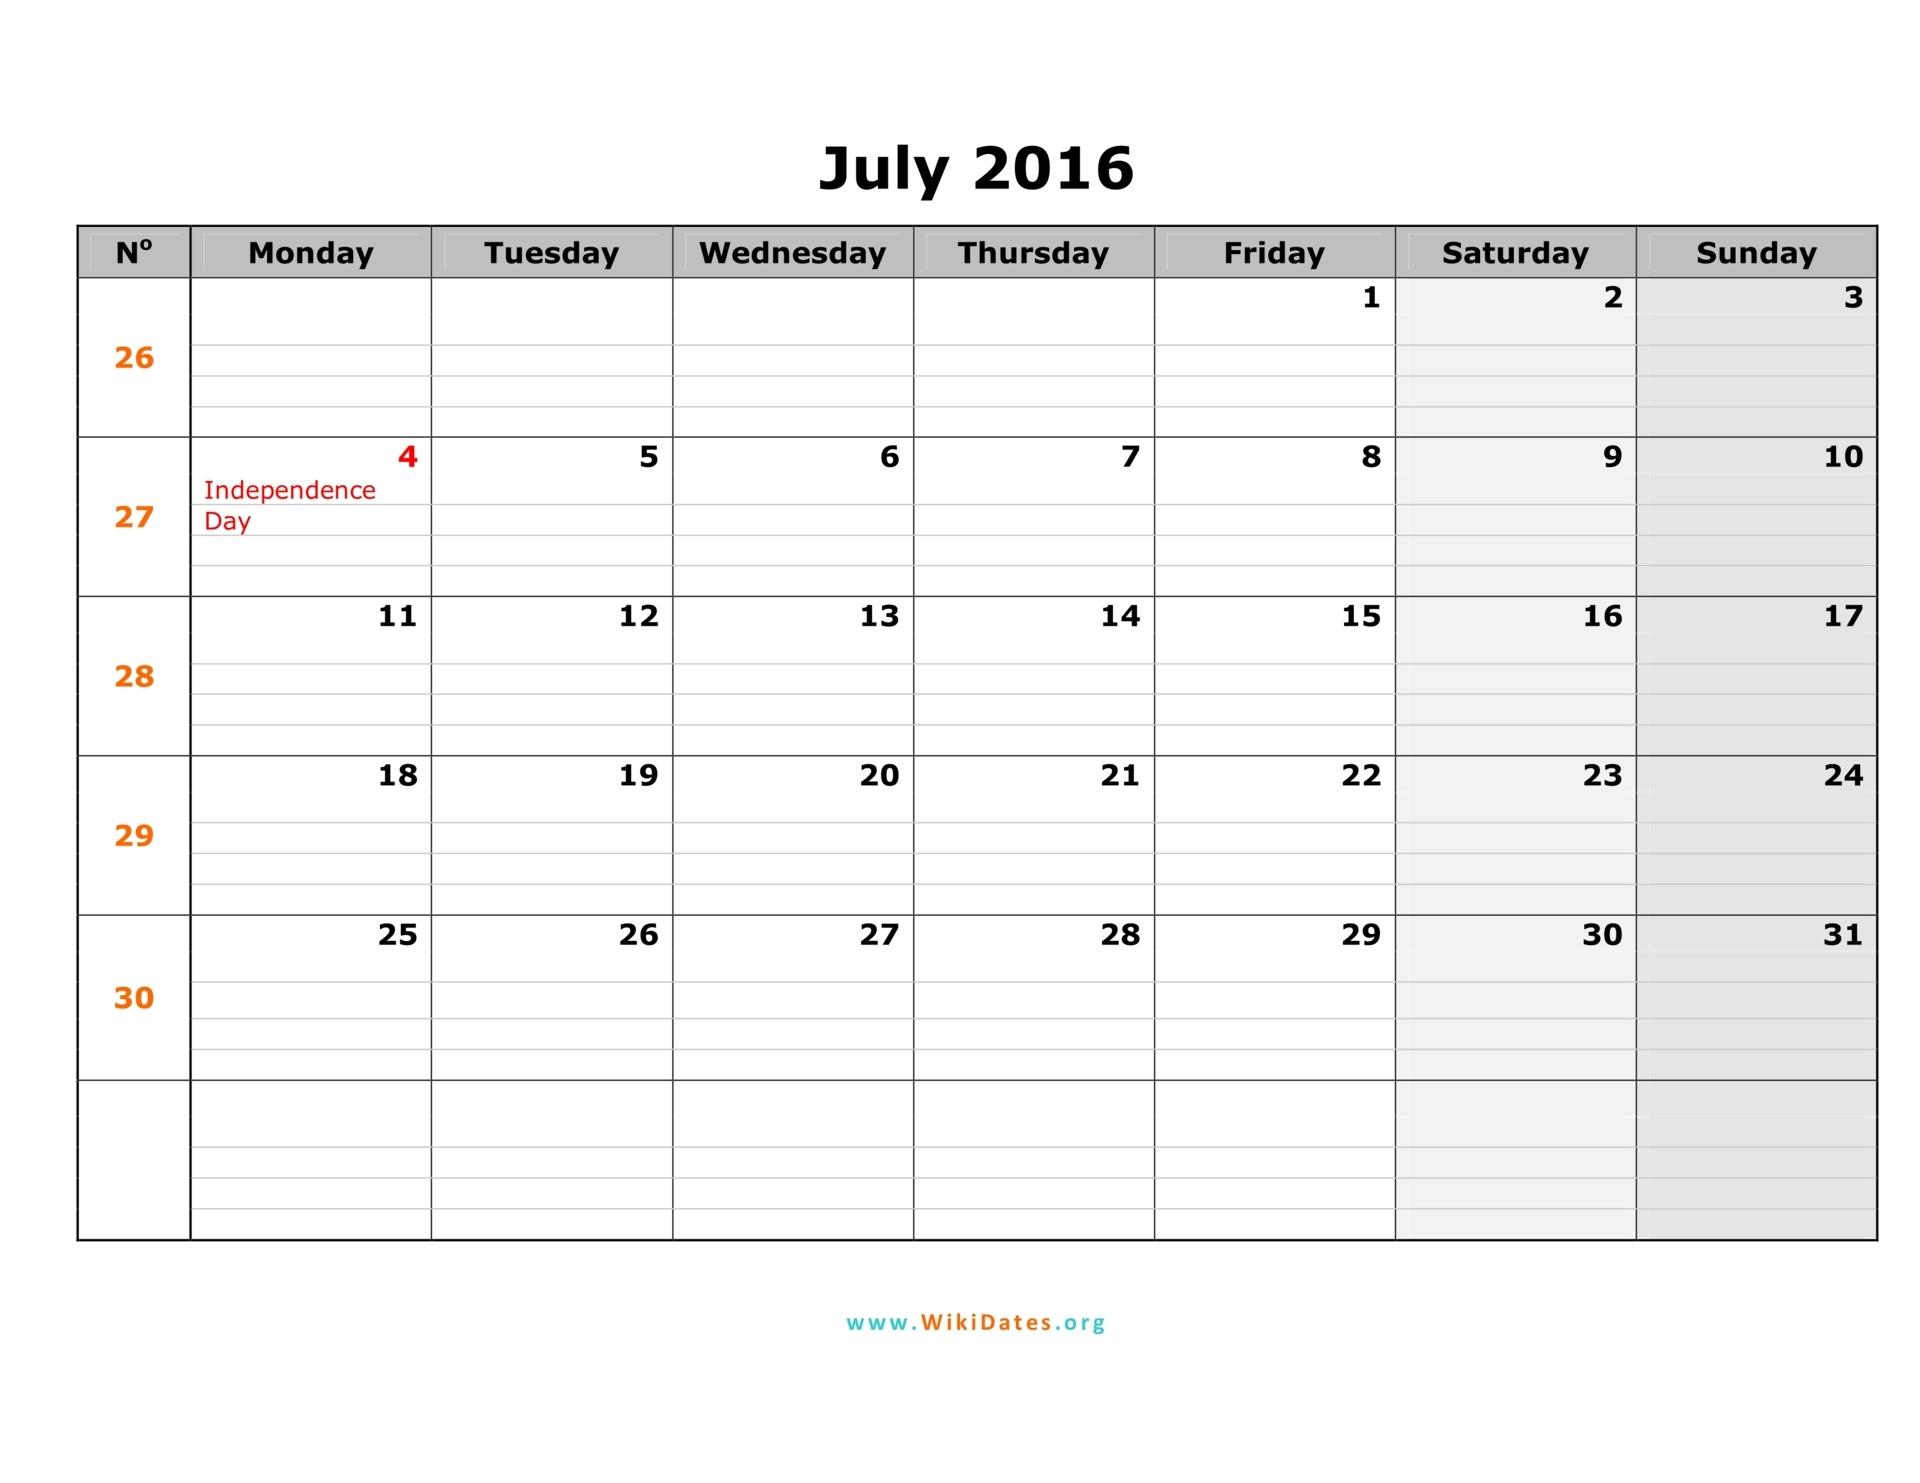 July 2016 Calendar | WikiDates.org